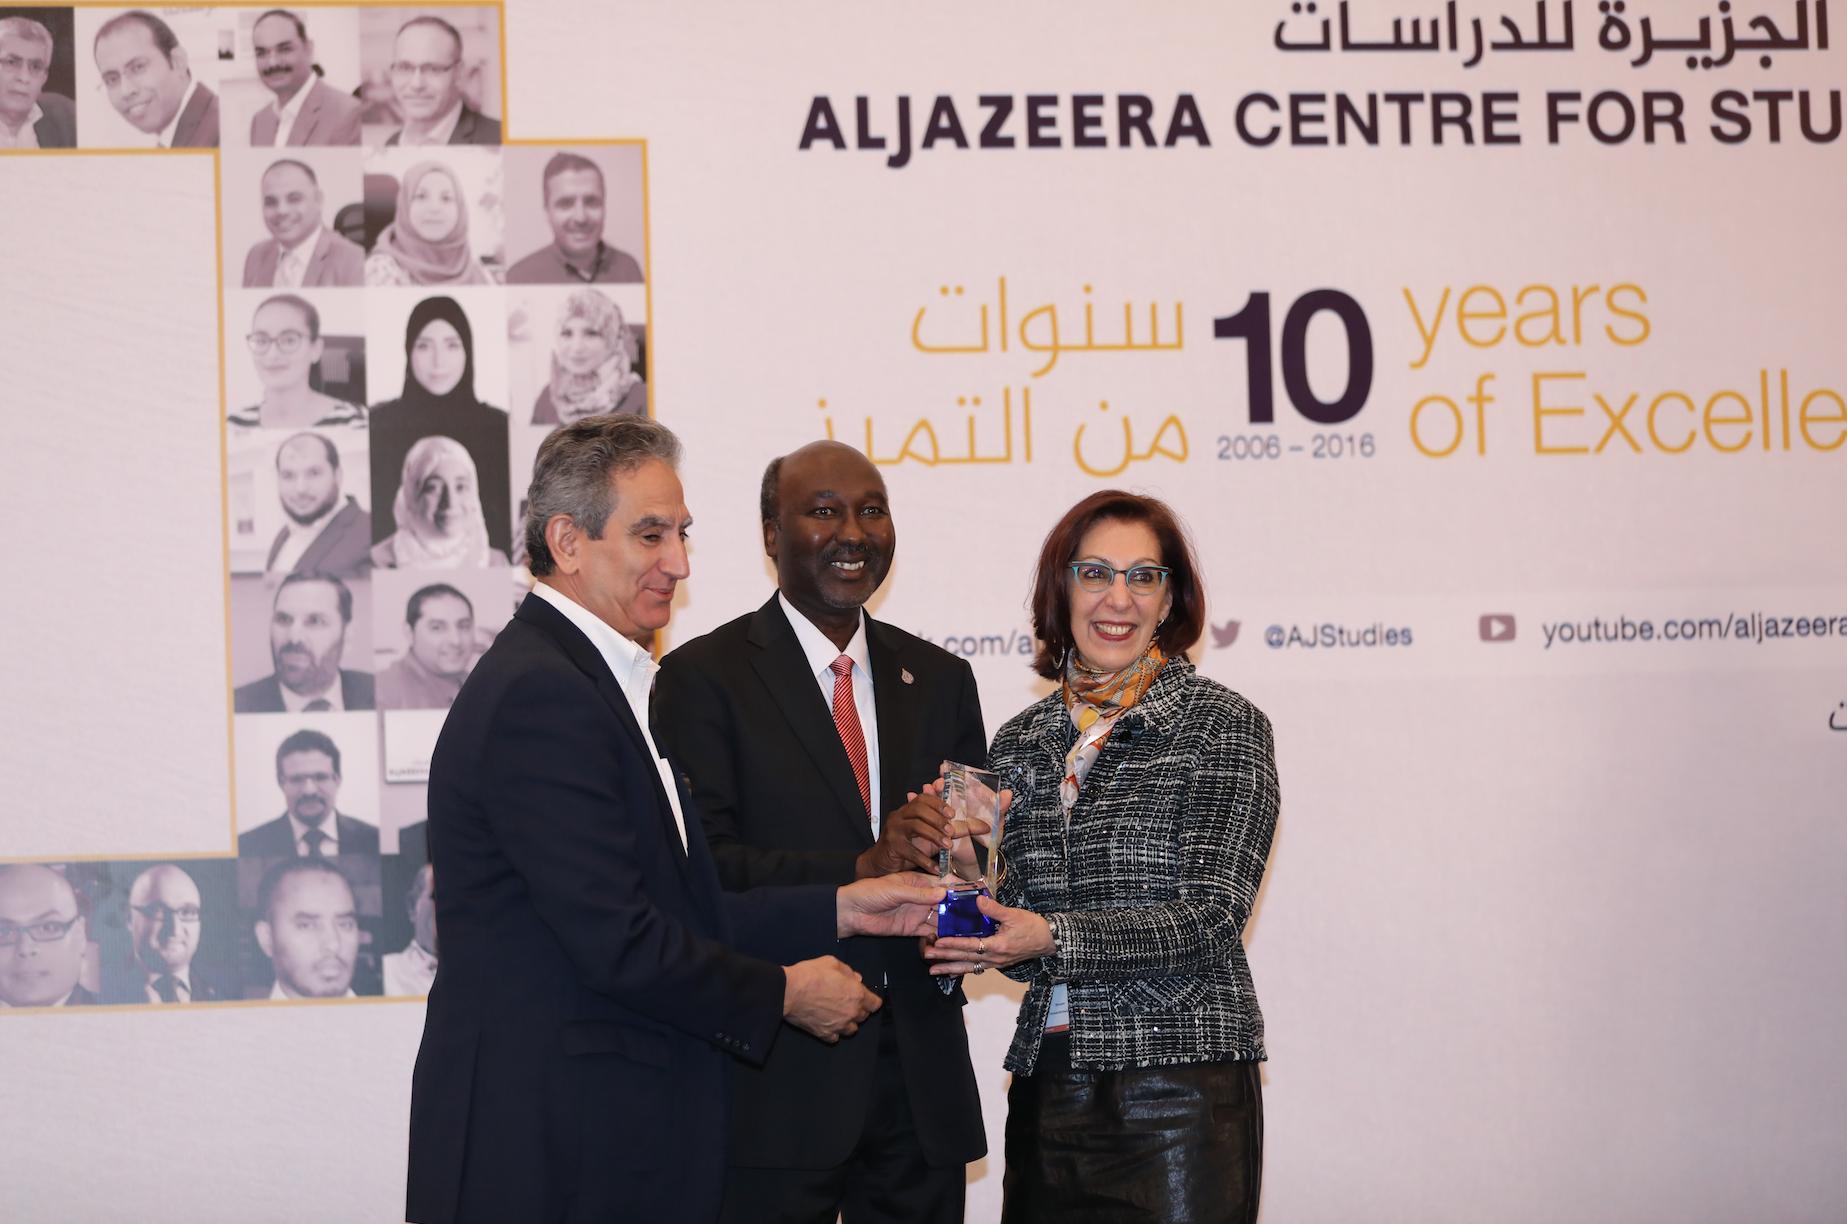 Dr. Mostefa Souag, Acting Director General of Al Jazeera;  Dr. Salah Eddin Elzein, Director of Al Jazeera Center for Studies and Dr. Roxane Farmanfarmaian, Principal Investigator of the University of Cambridge - Al Jazeera Media Project